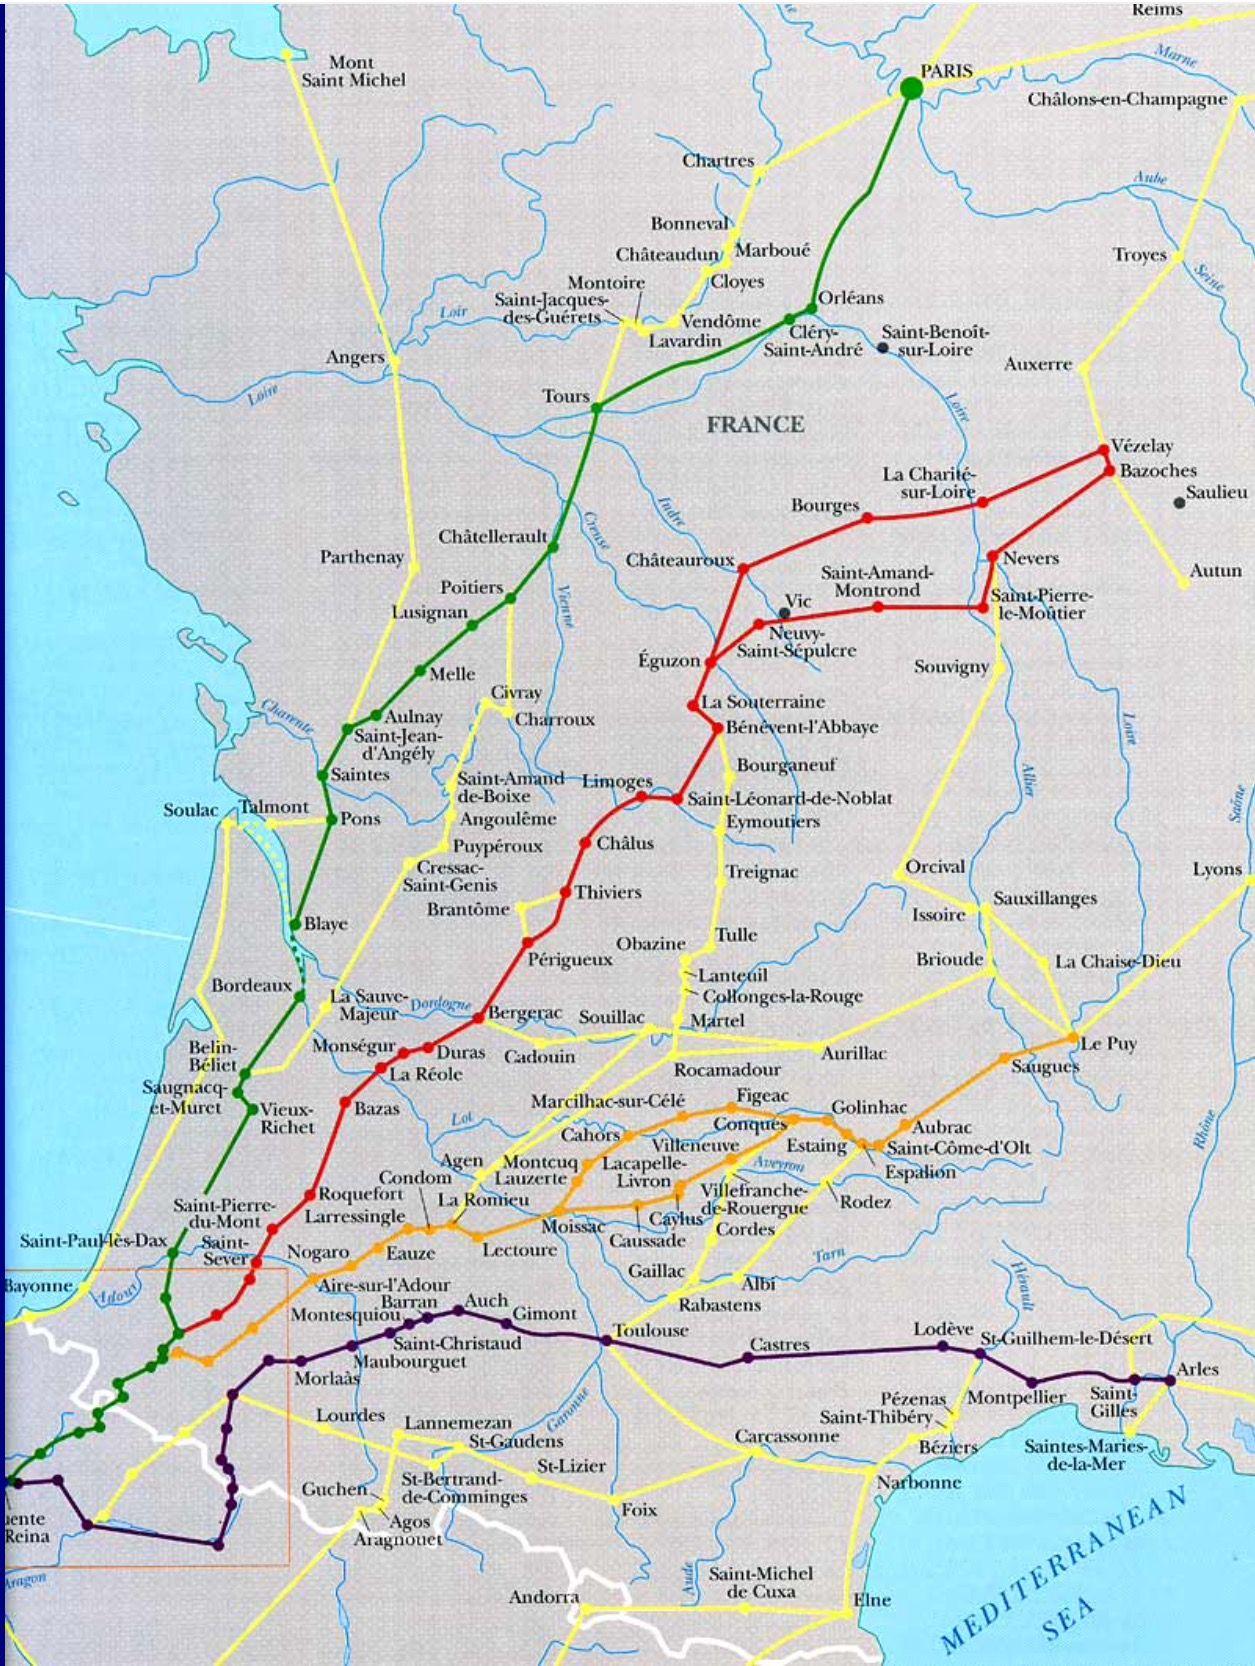 French Pilgrims Roads To Santiago De Compostela Jakobsweg